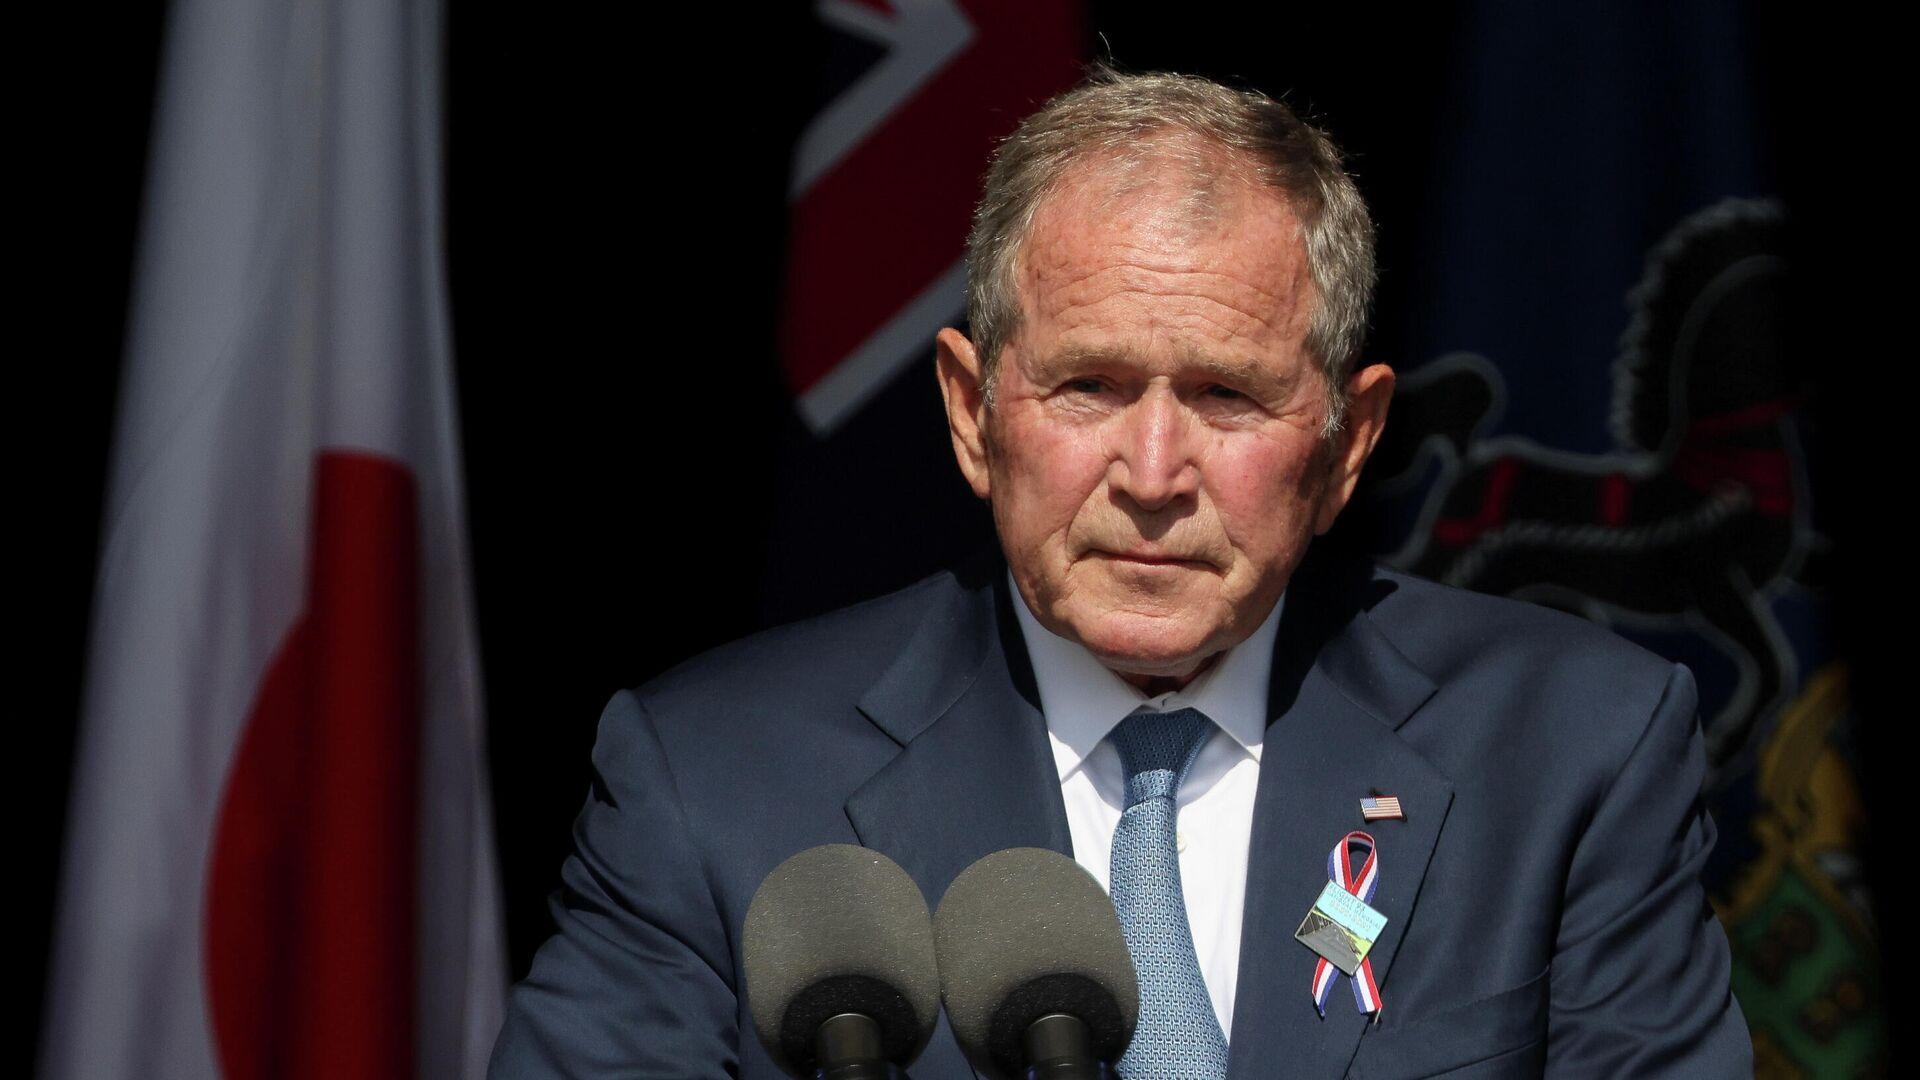 Former U.S. President George W. Bush speaks during an event commemorating the 20th anniversary of the September 11, 2001 attacks at the Flight 93 National Memorial in Stoystown, Pennsylvania, U.S., September 11, 2021. - Sputnik International, 1920, 11.09.2021